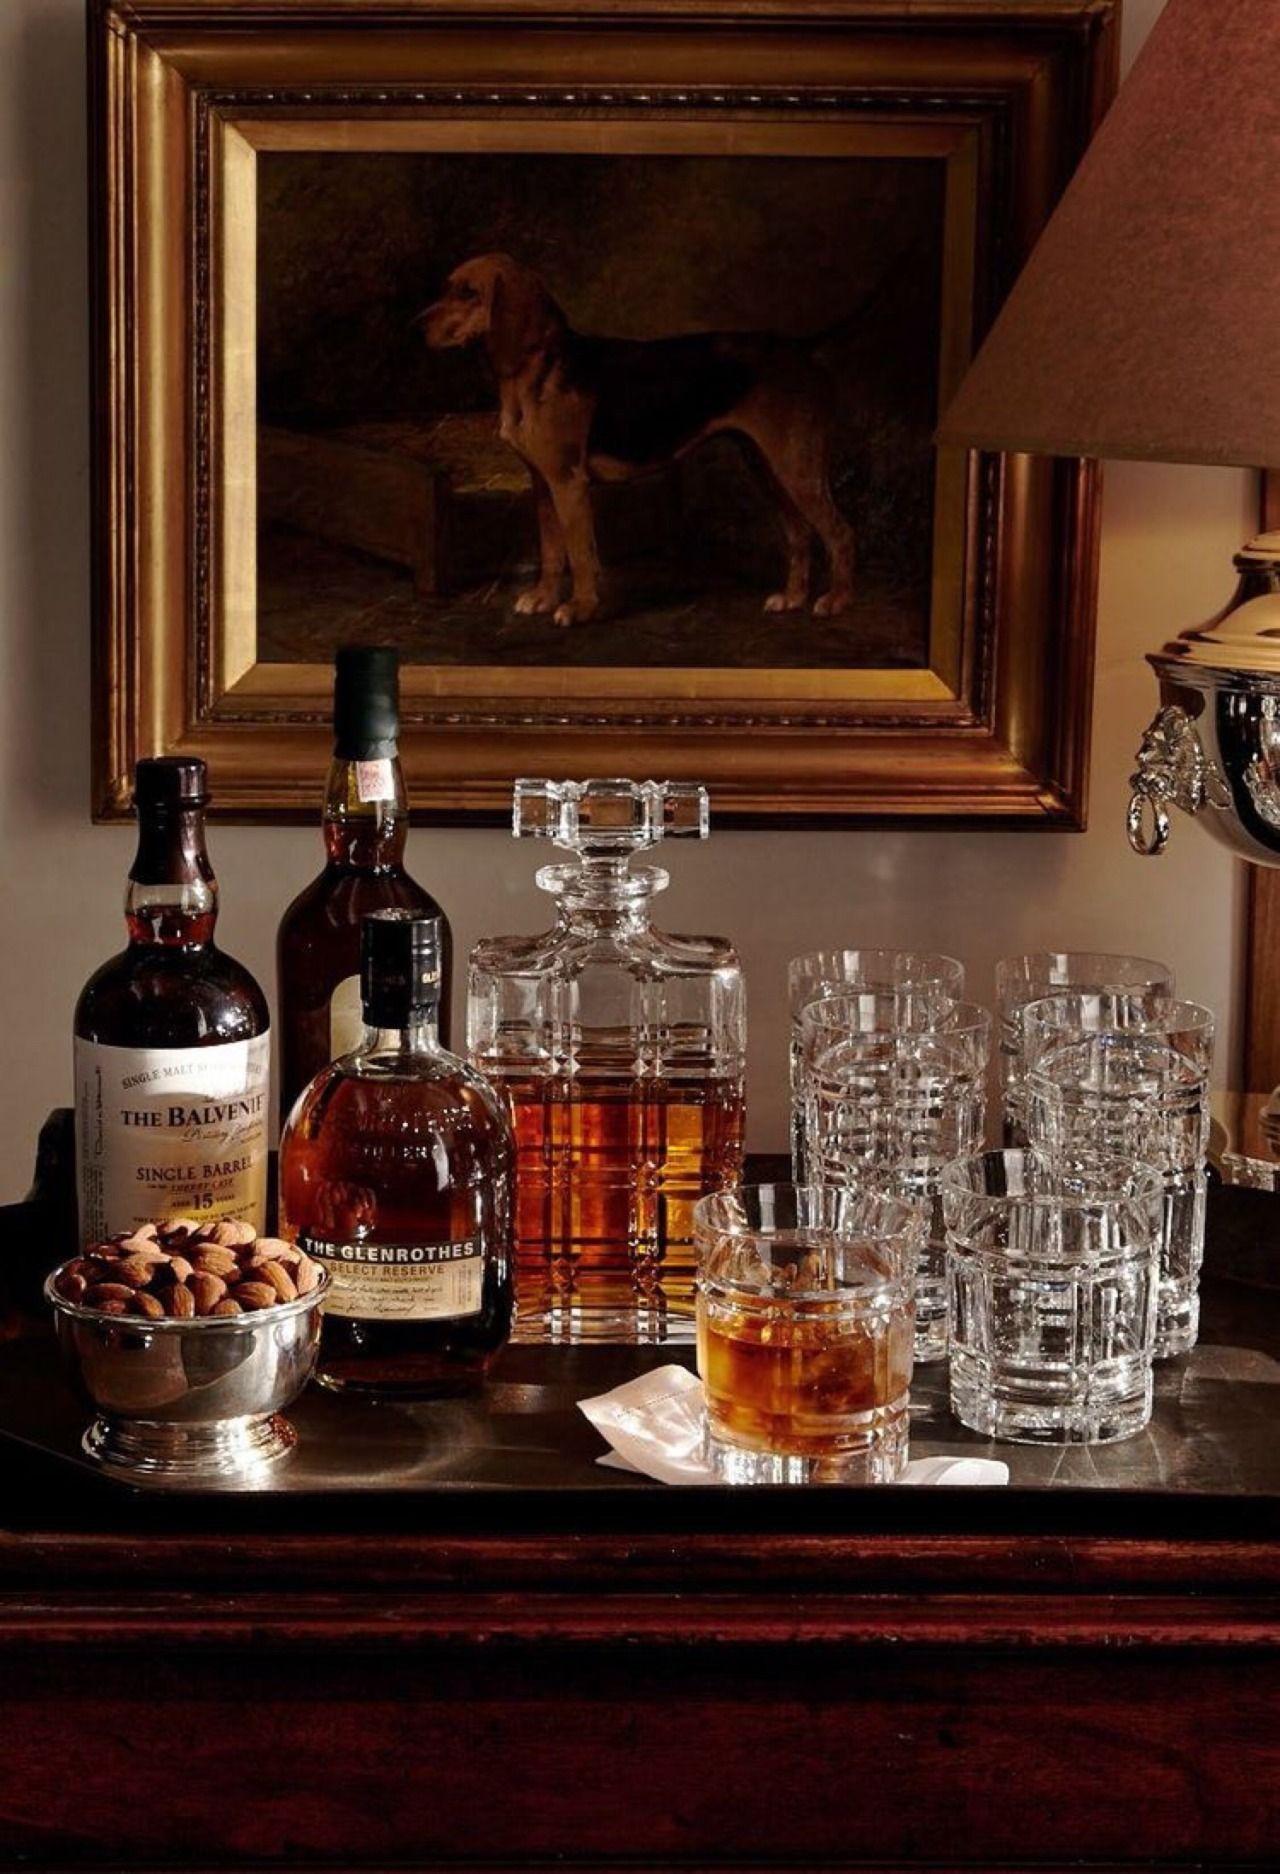 Gentleman Bobwhite : Photo | happy hour | Pinterest | Bar, Bar carts ...